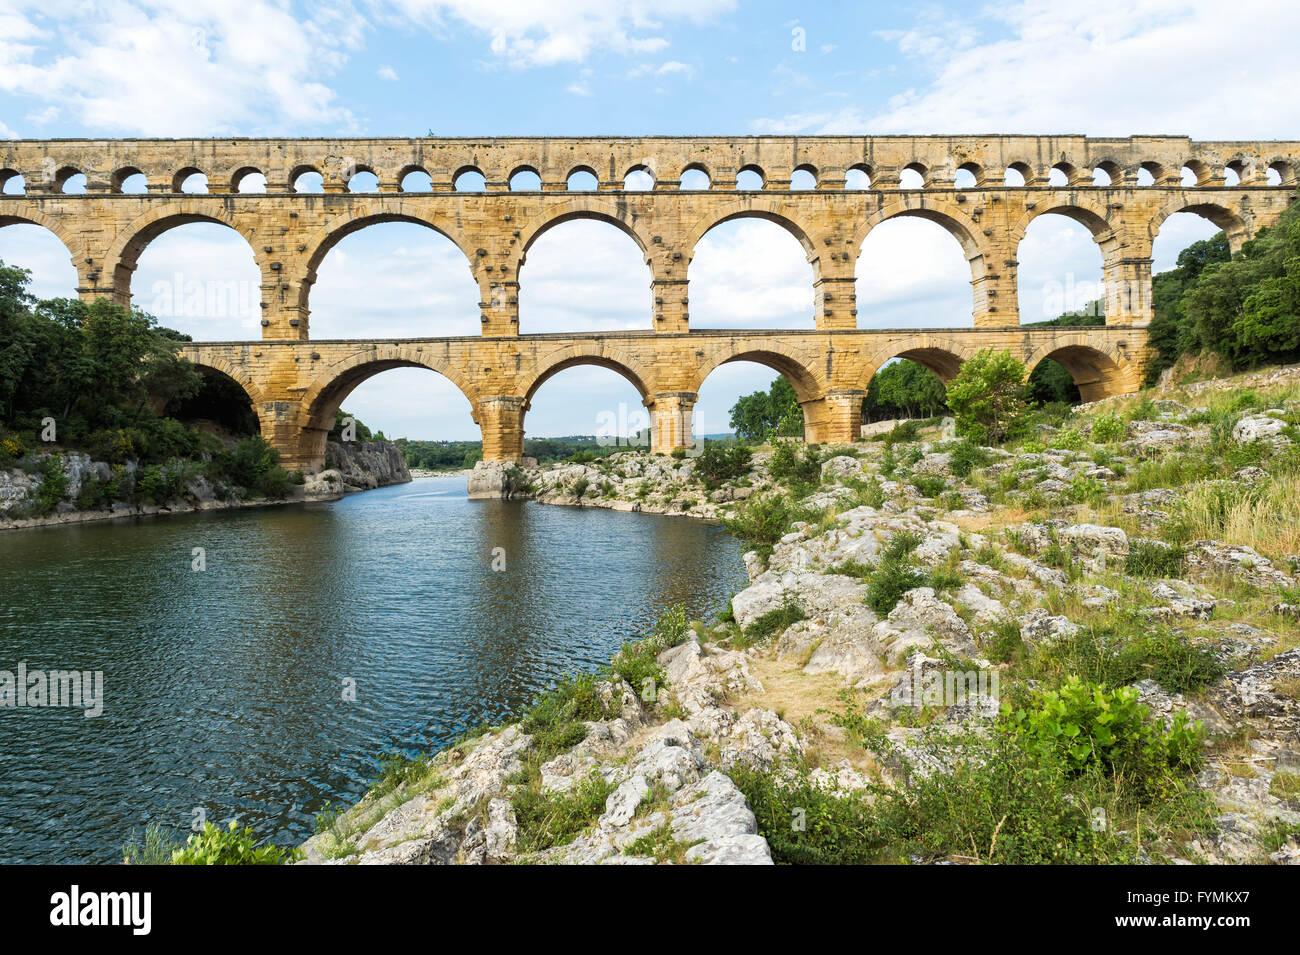 Pont du Gard, Region Languedoc Roussillon, Frankreich, UNESCO-Weltkulturerbe Stockbild